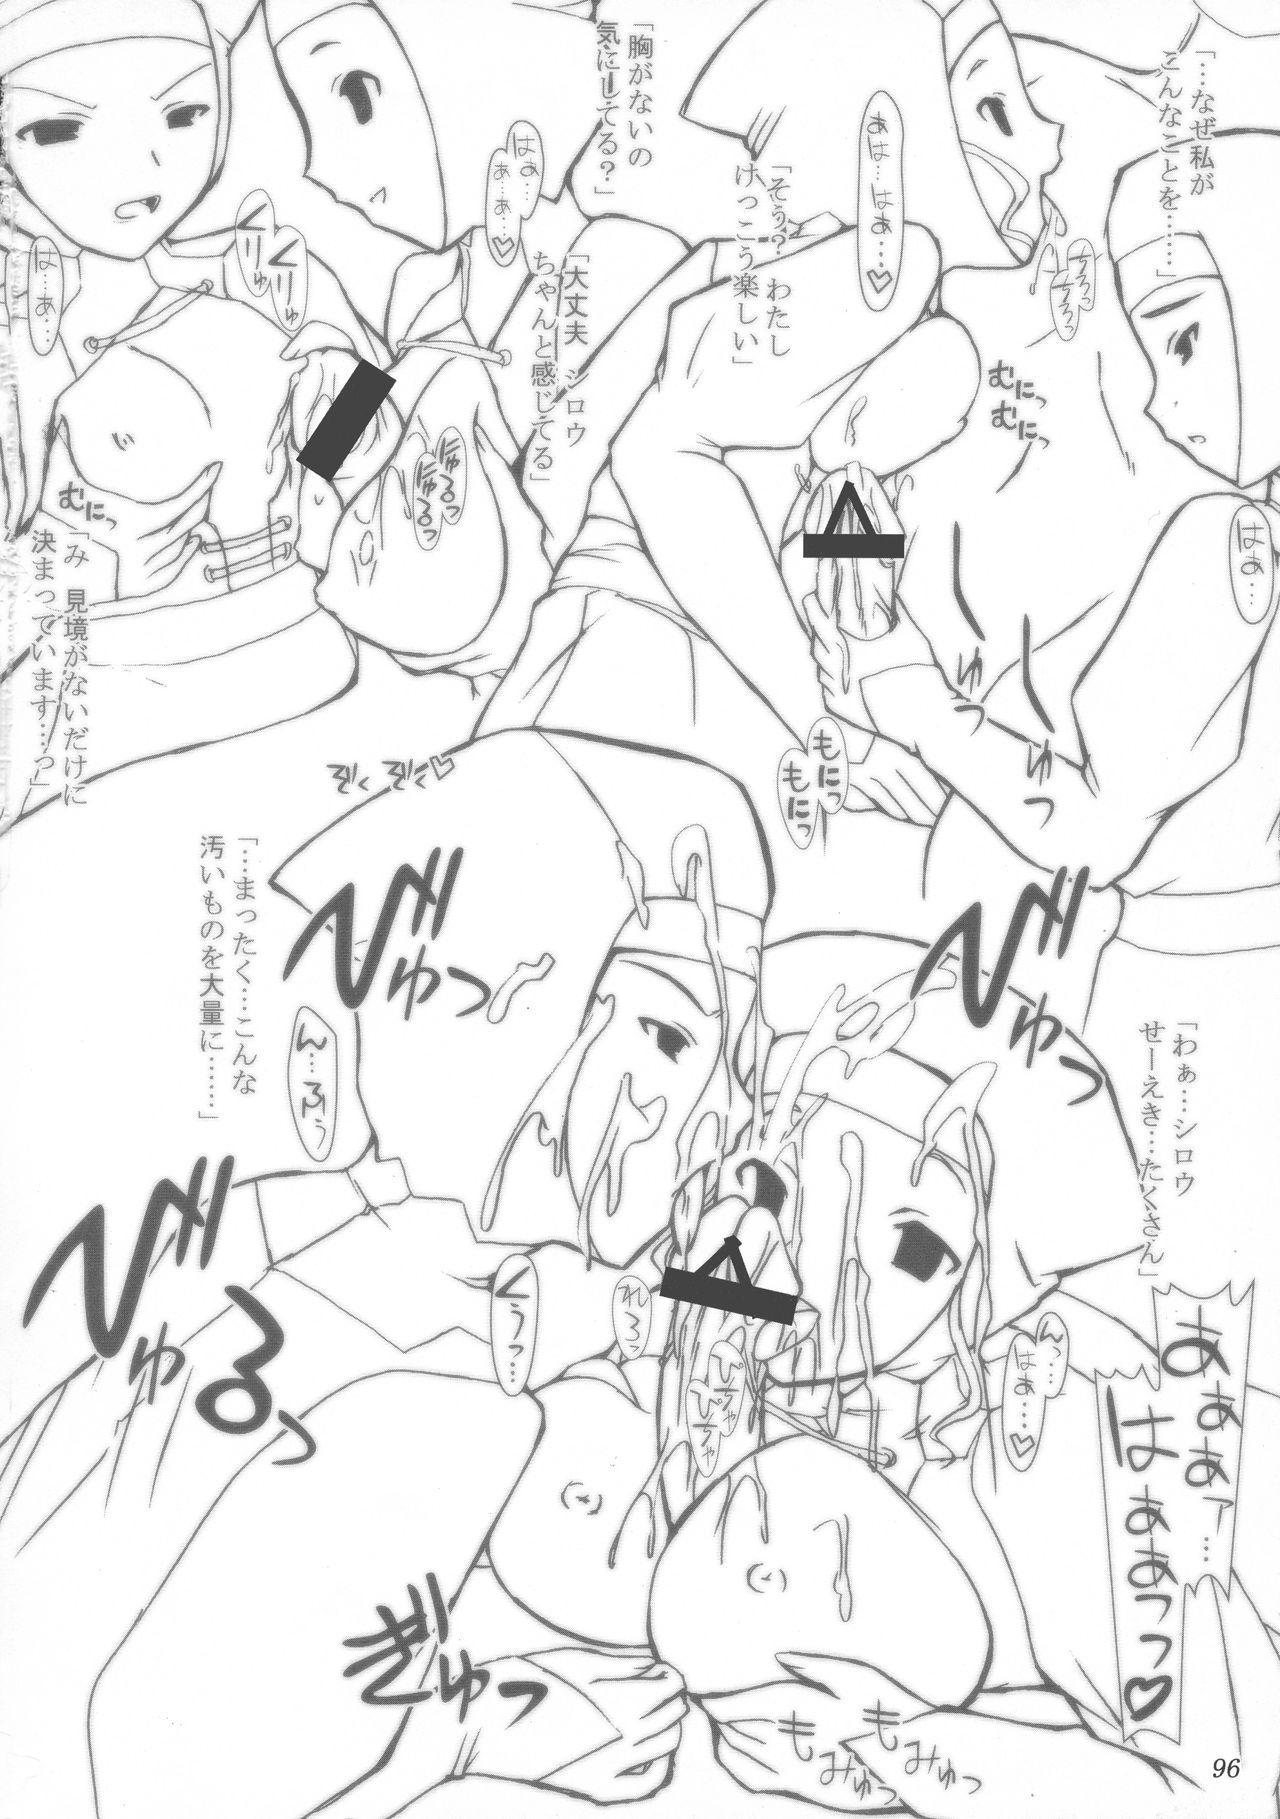 (C73) [ashitakara-ganbaru (Yameta Takashi)] ZIG-ZIG-ZIG 3 -2004~2005- (Various) 95